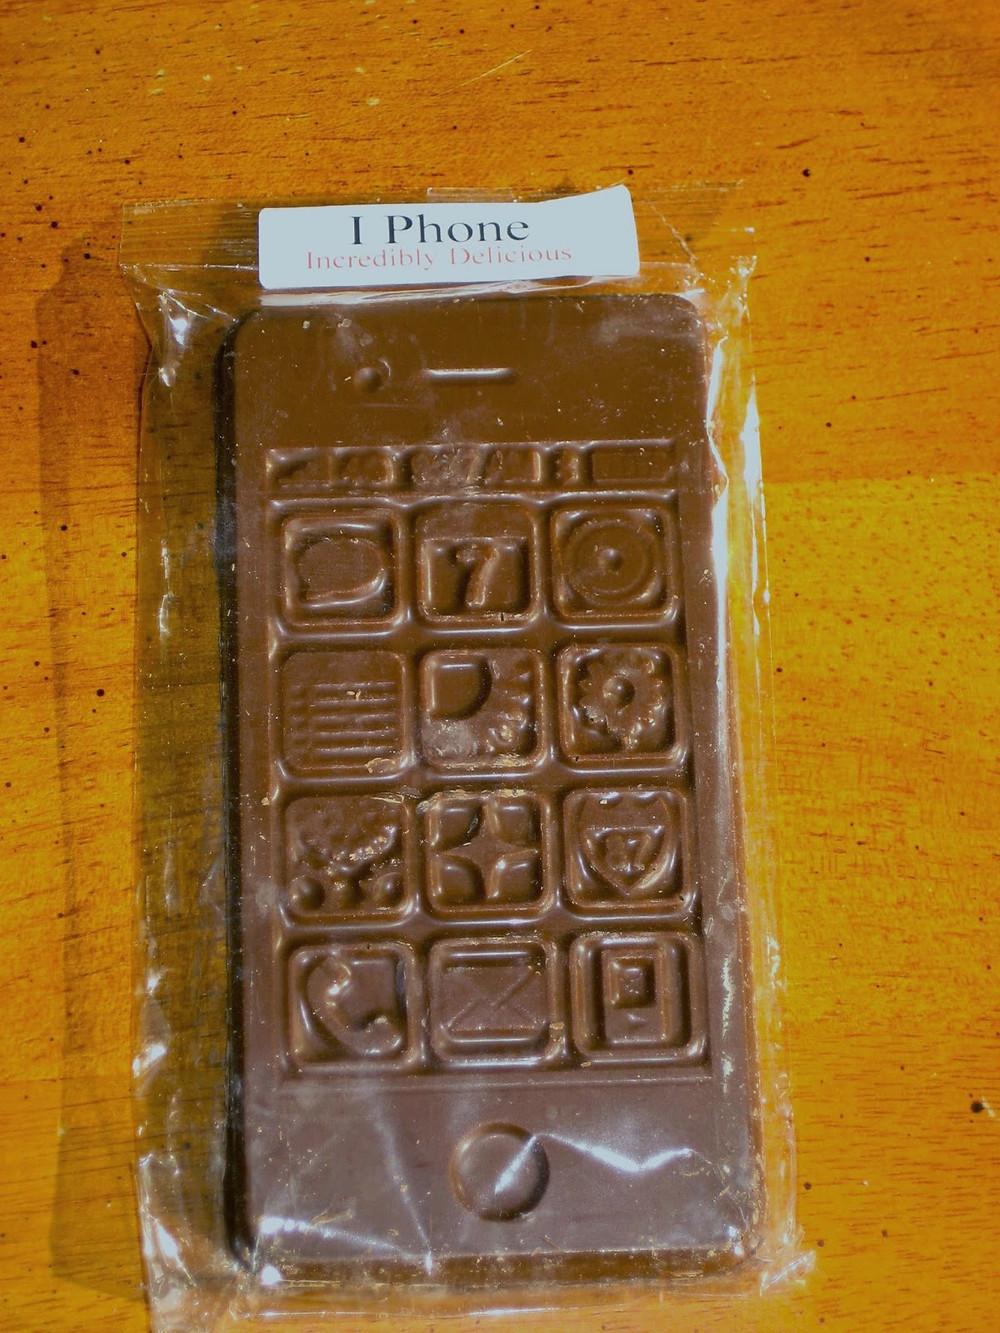 4-19-14 Chocolate iPhone.jpg